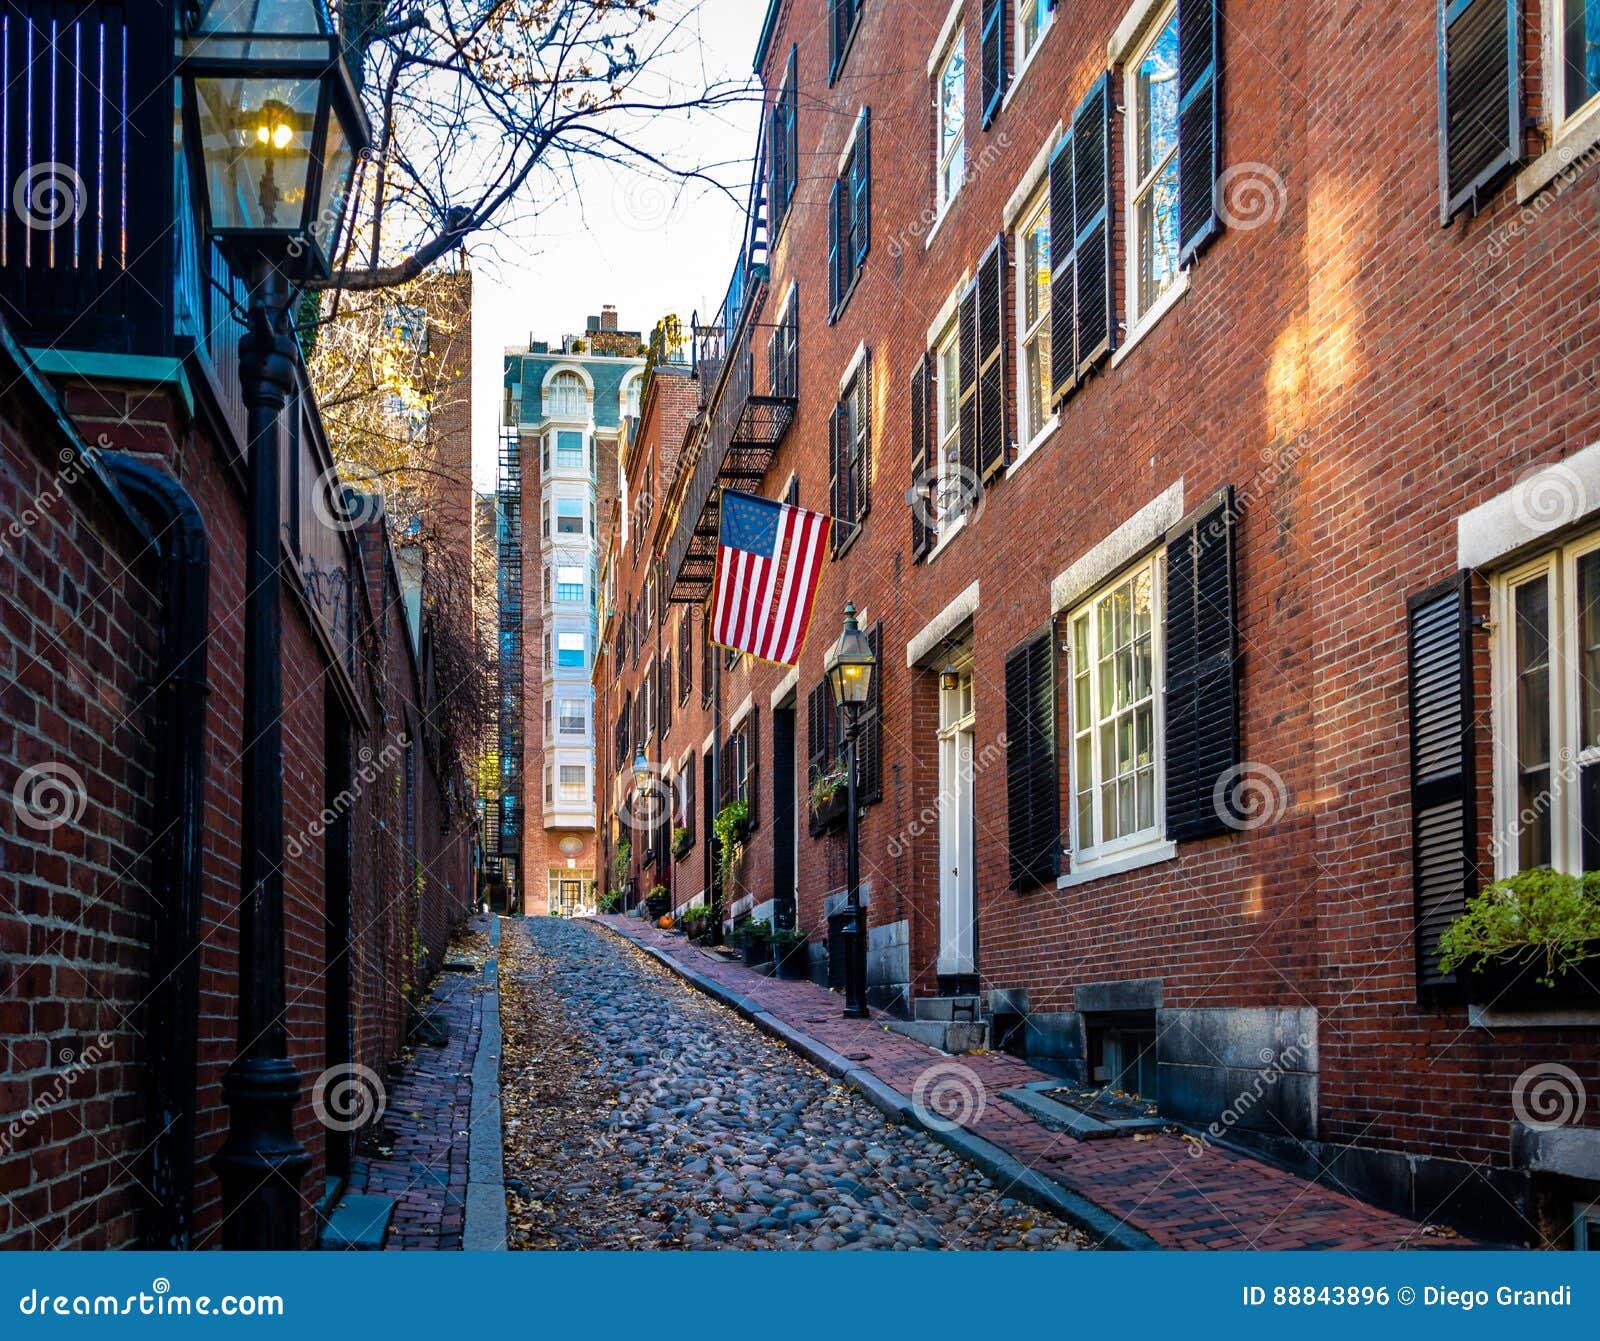 Calle de la bellota - Boston, Massachusetts, los E.E.U.U.